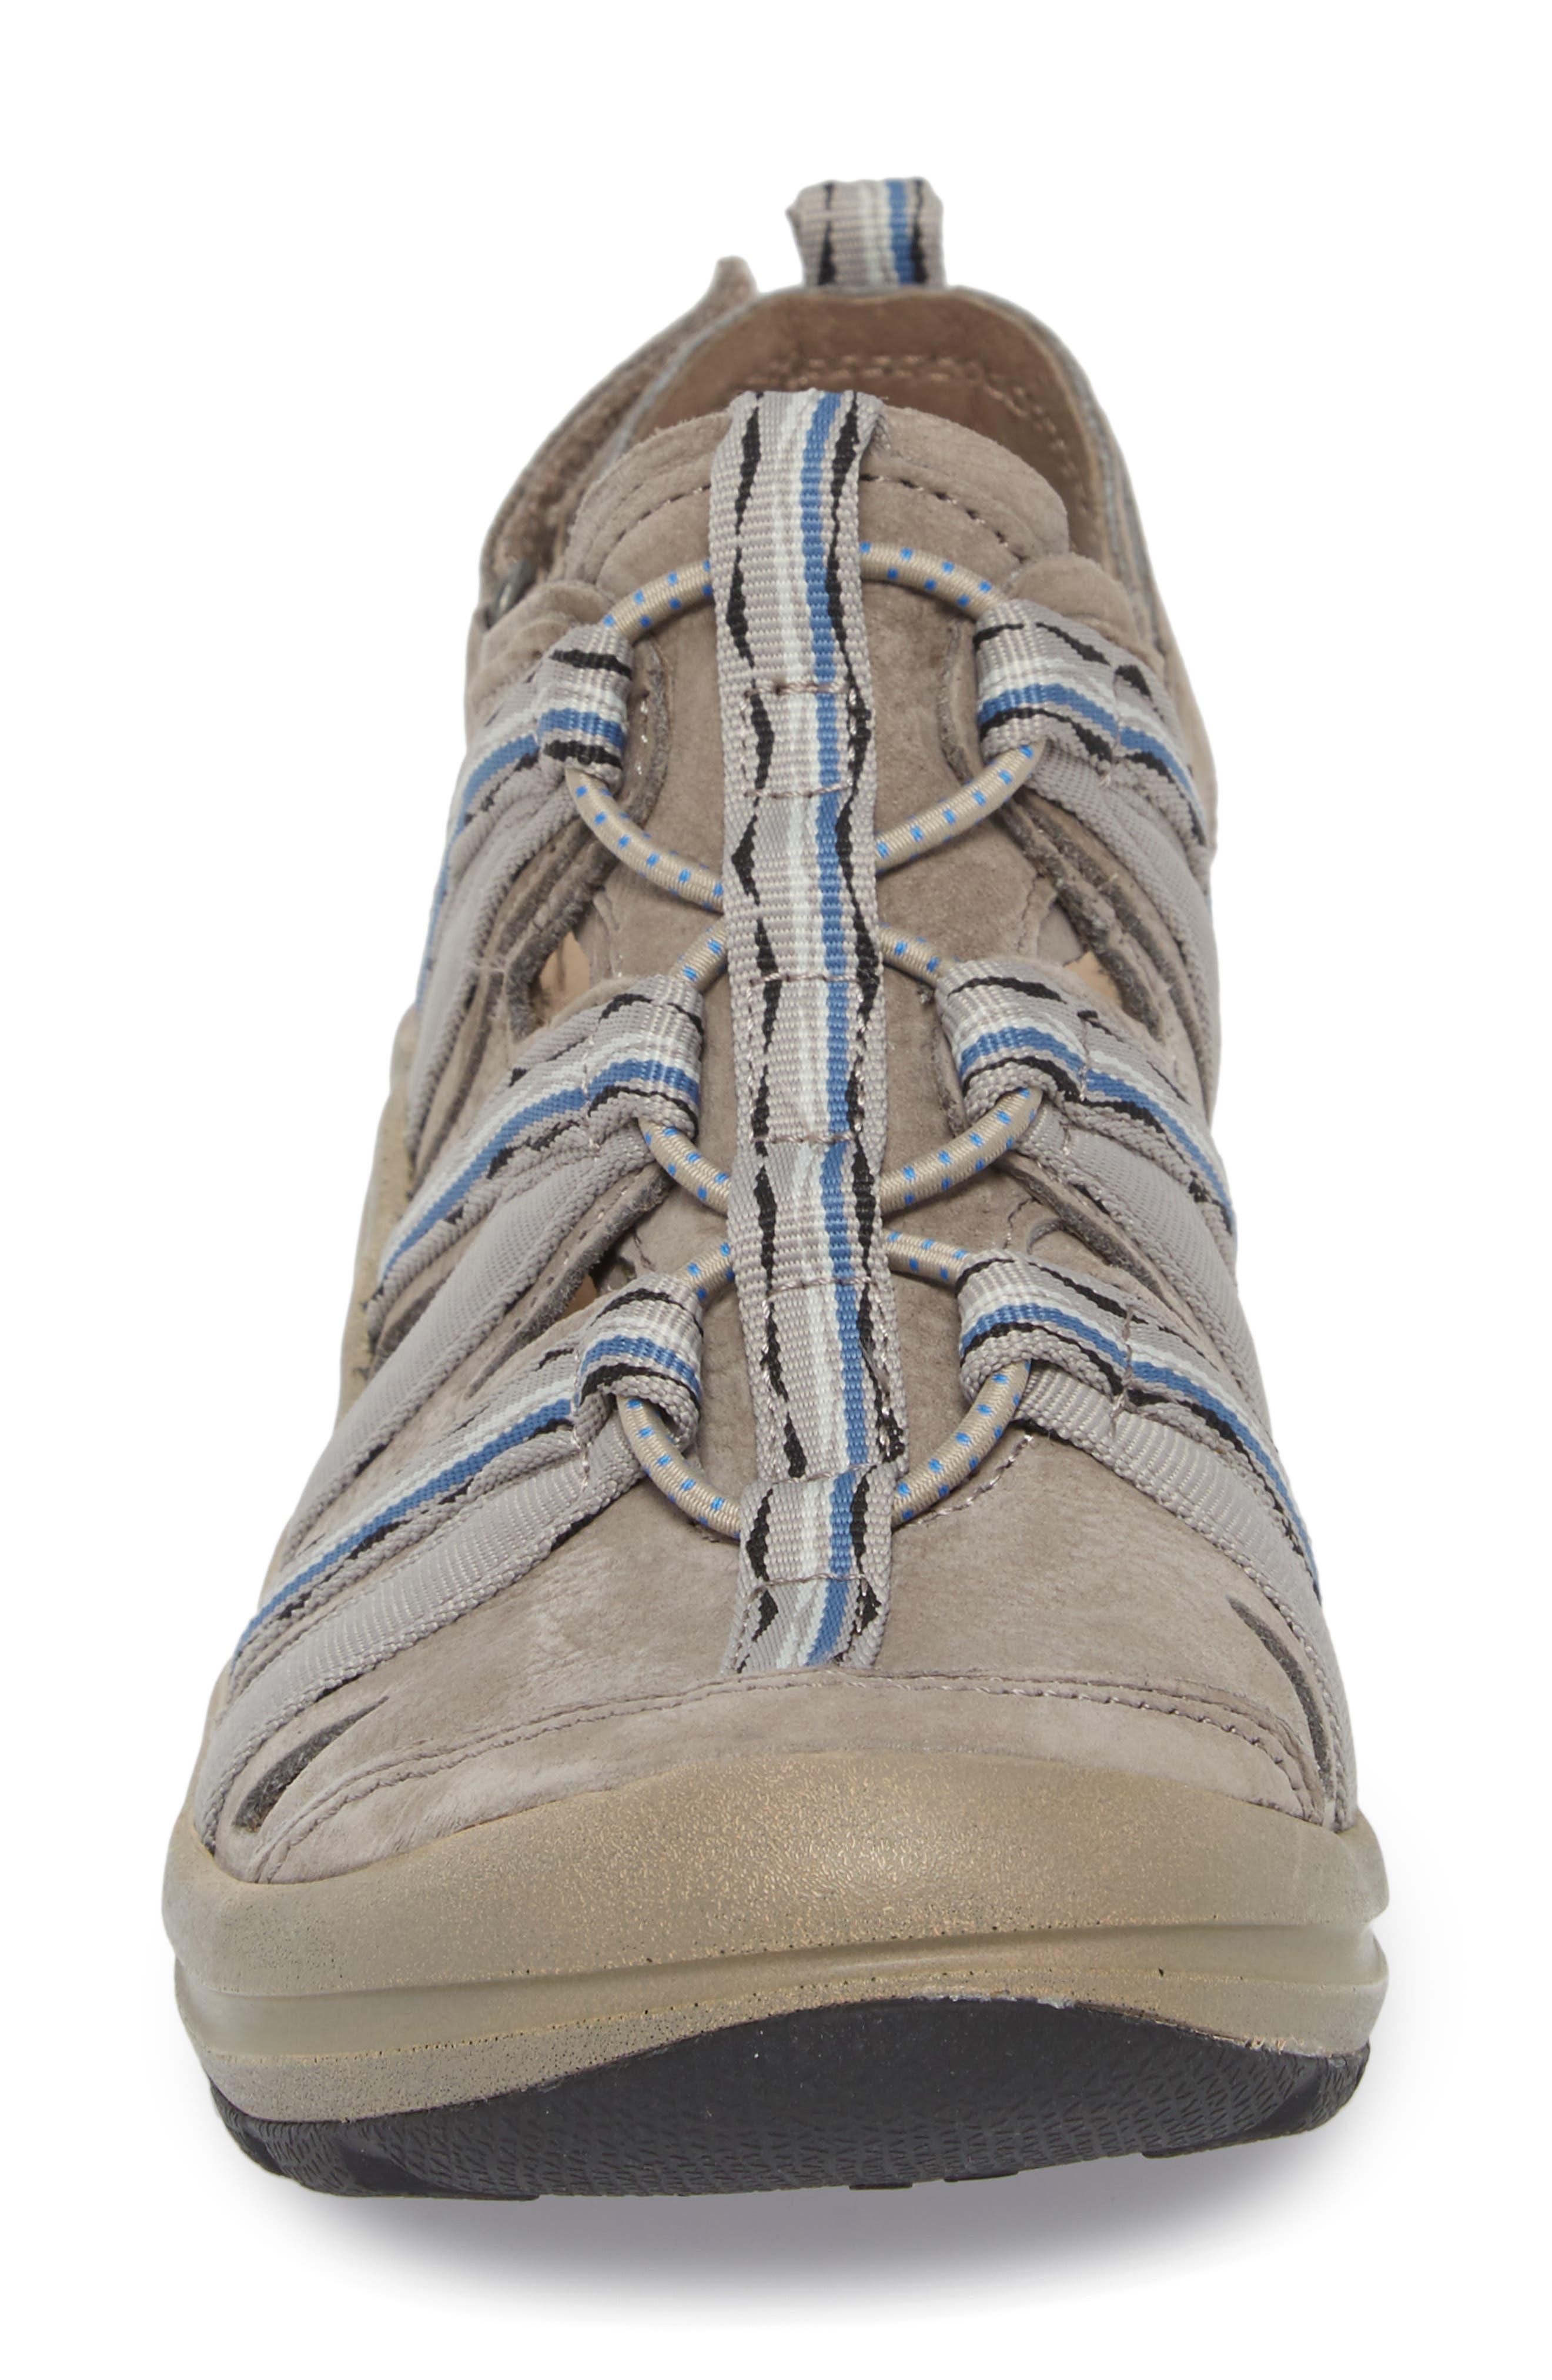 Malabar Sport Sandal,                             Alternate thumbnail 4, color,                             Paper Mache Leather